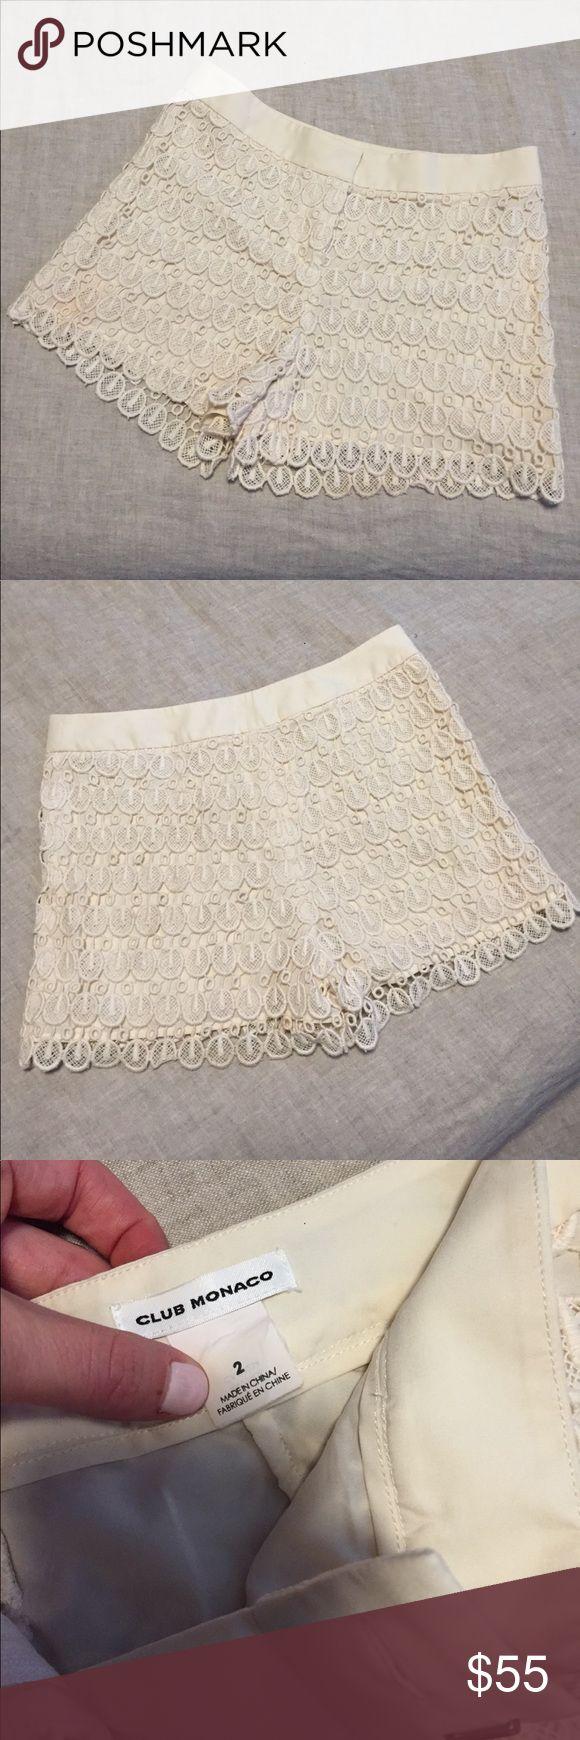 Club Monaco cream lace shorts Excellent condition! Club Monaco. Lined lace shorts size 2 in off white/ cream. Club Monaco Shorts